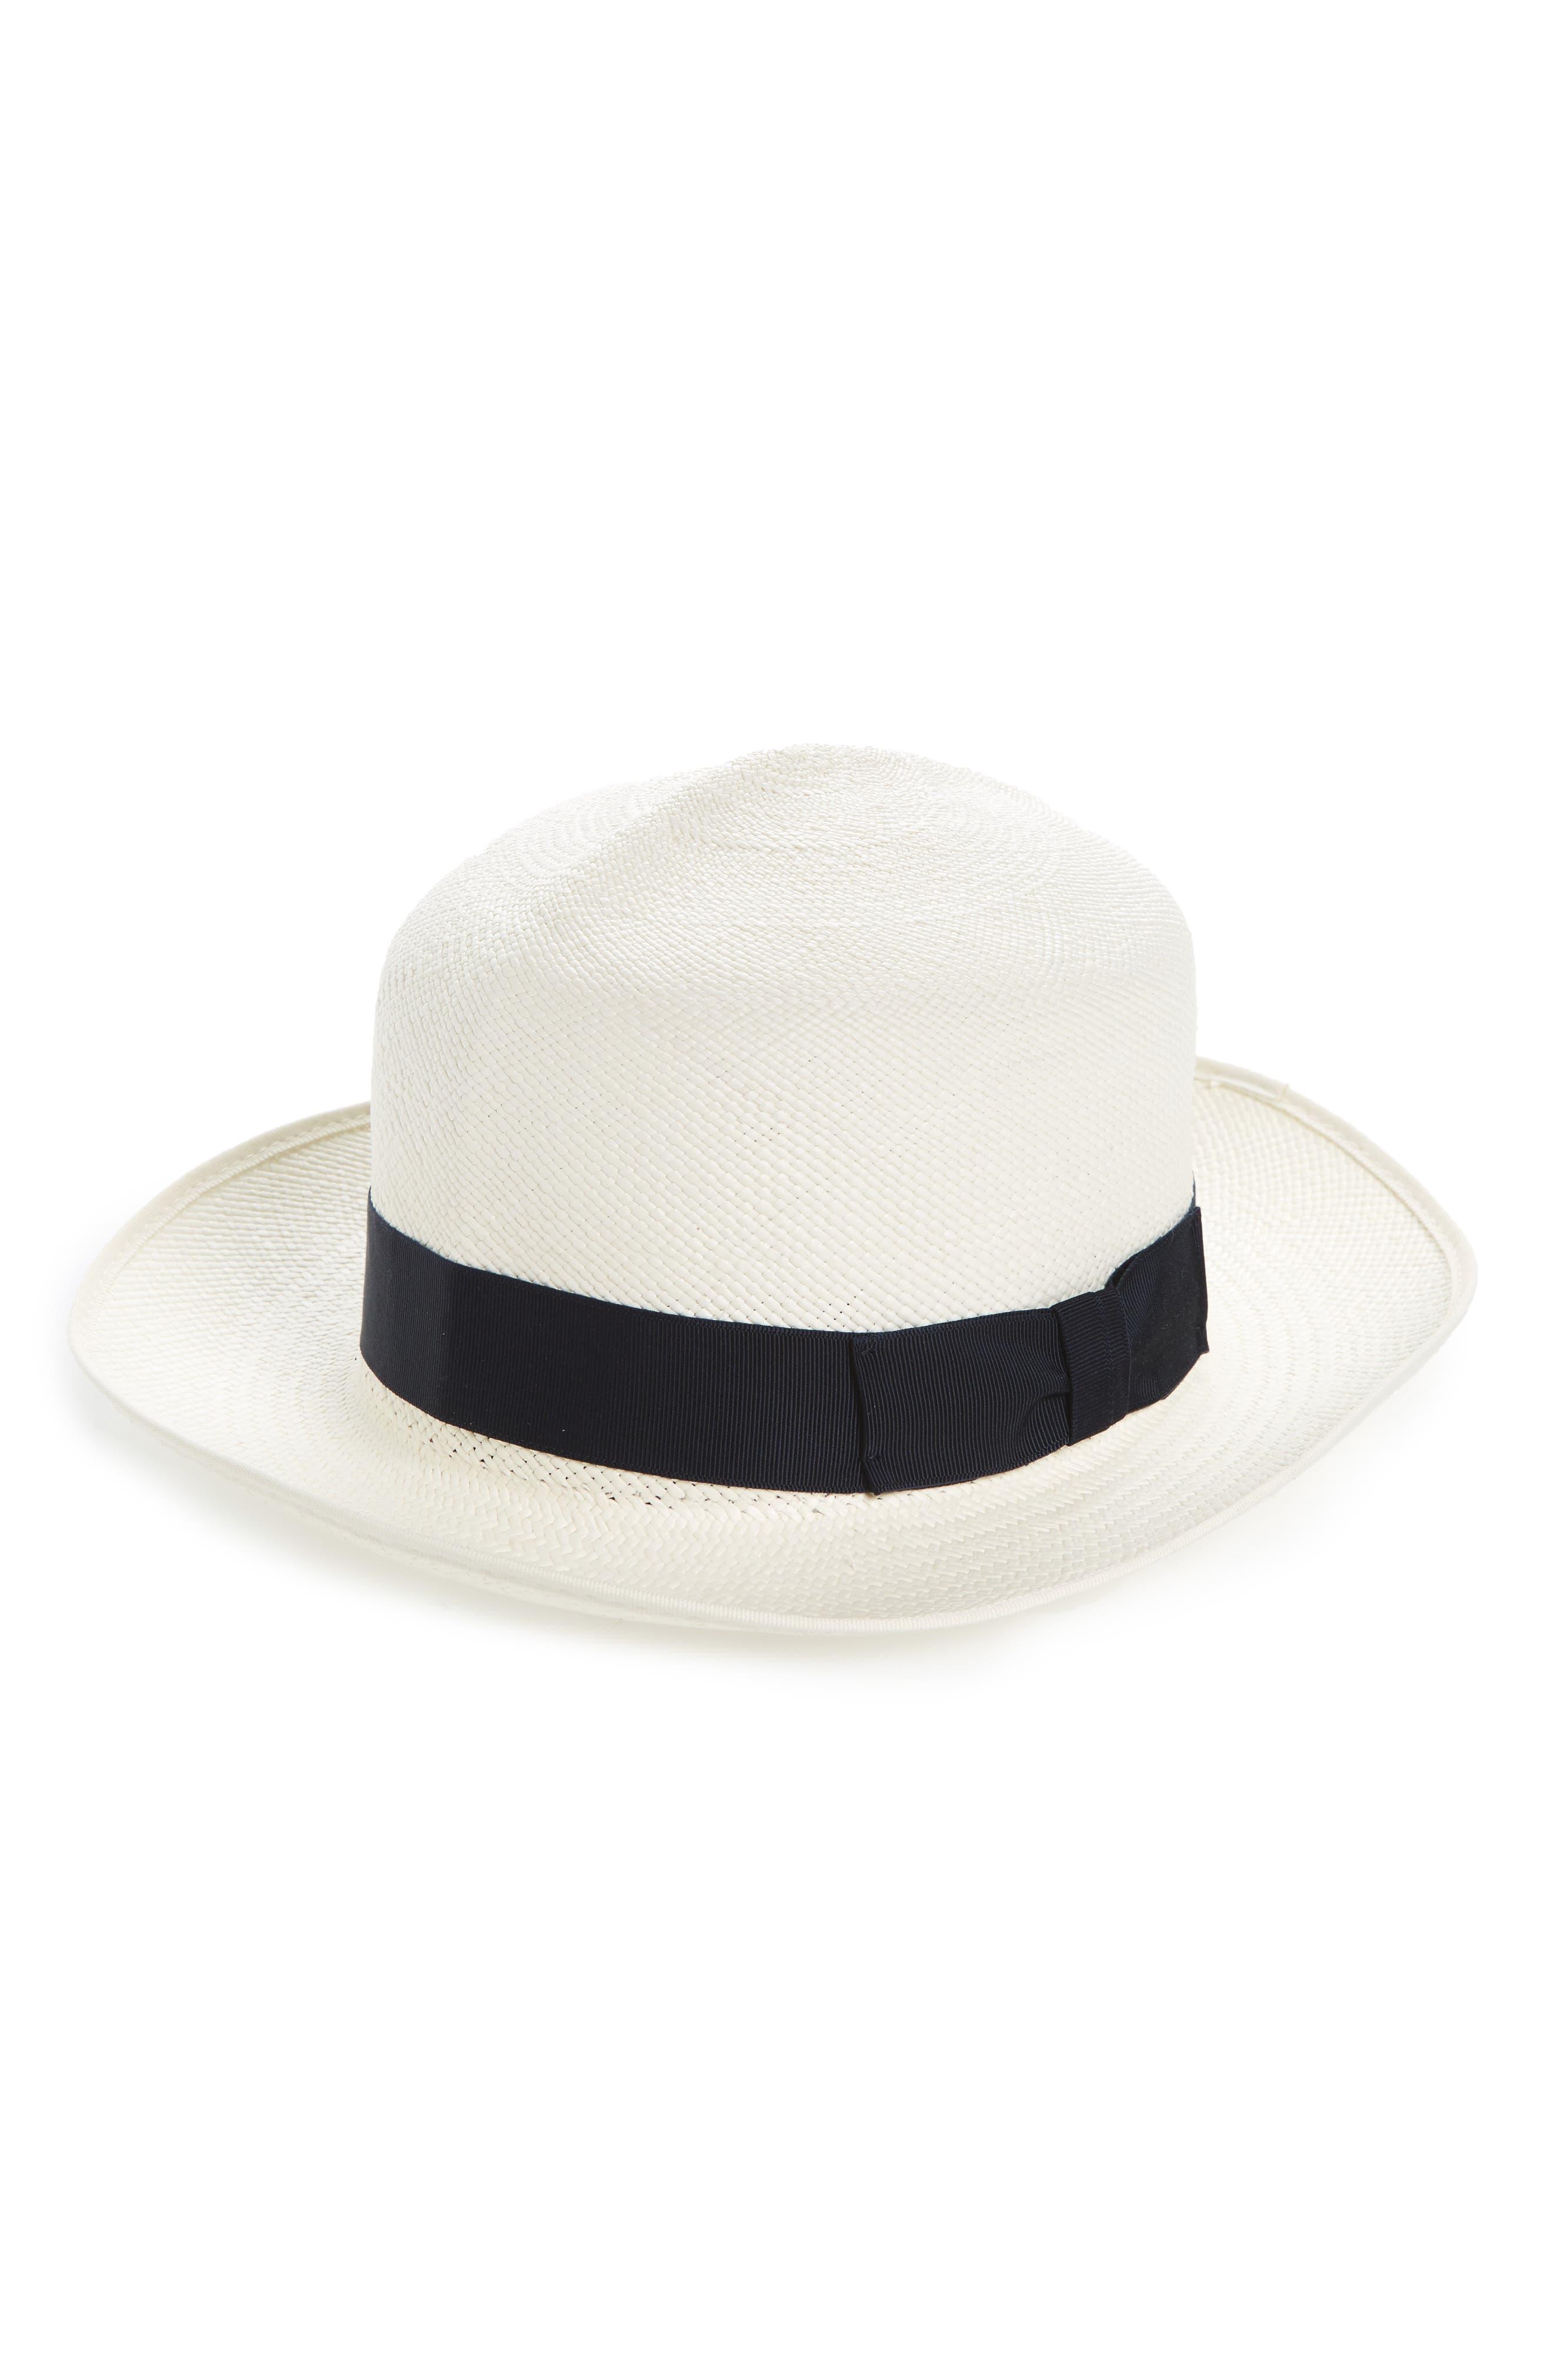 Alternate Image 1 Selected - Christy's Hats Folder Straw Panama Hat